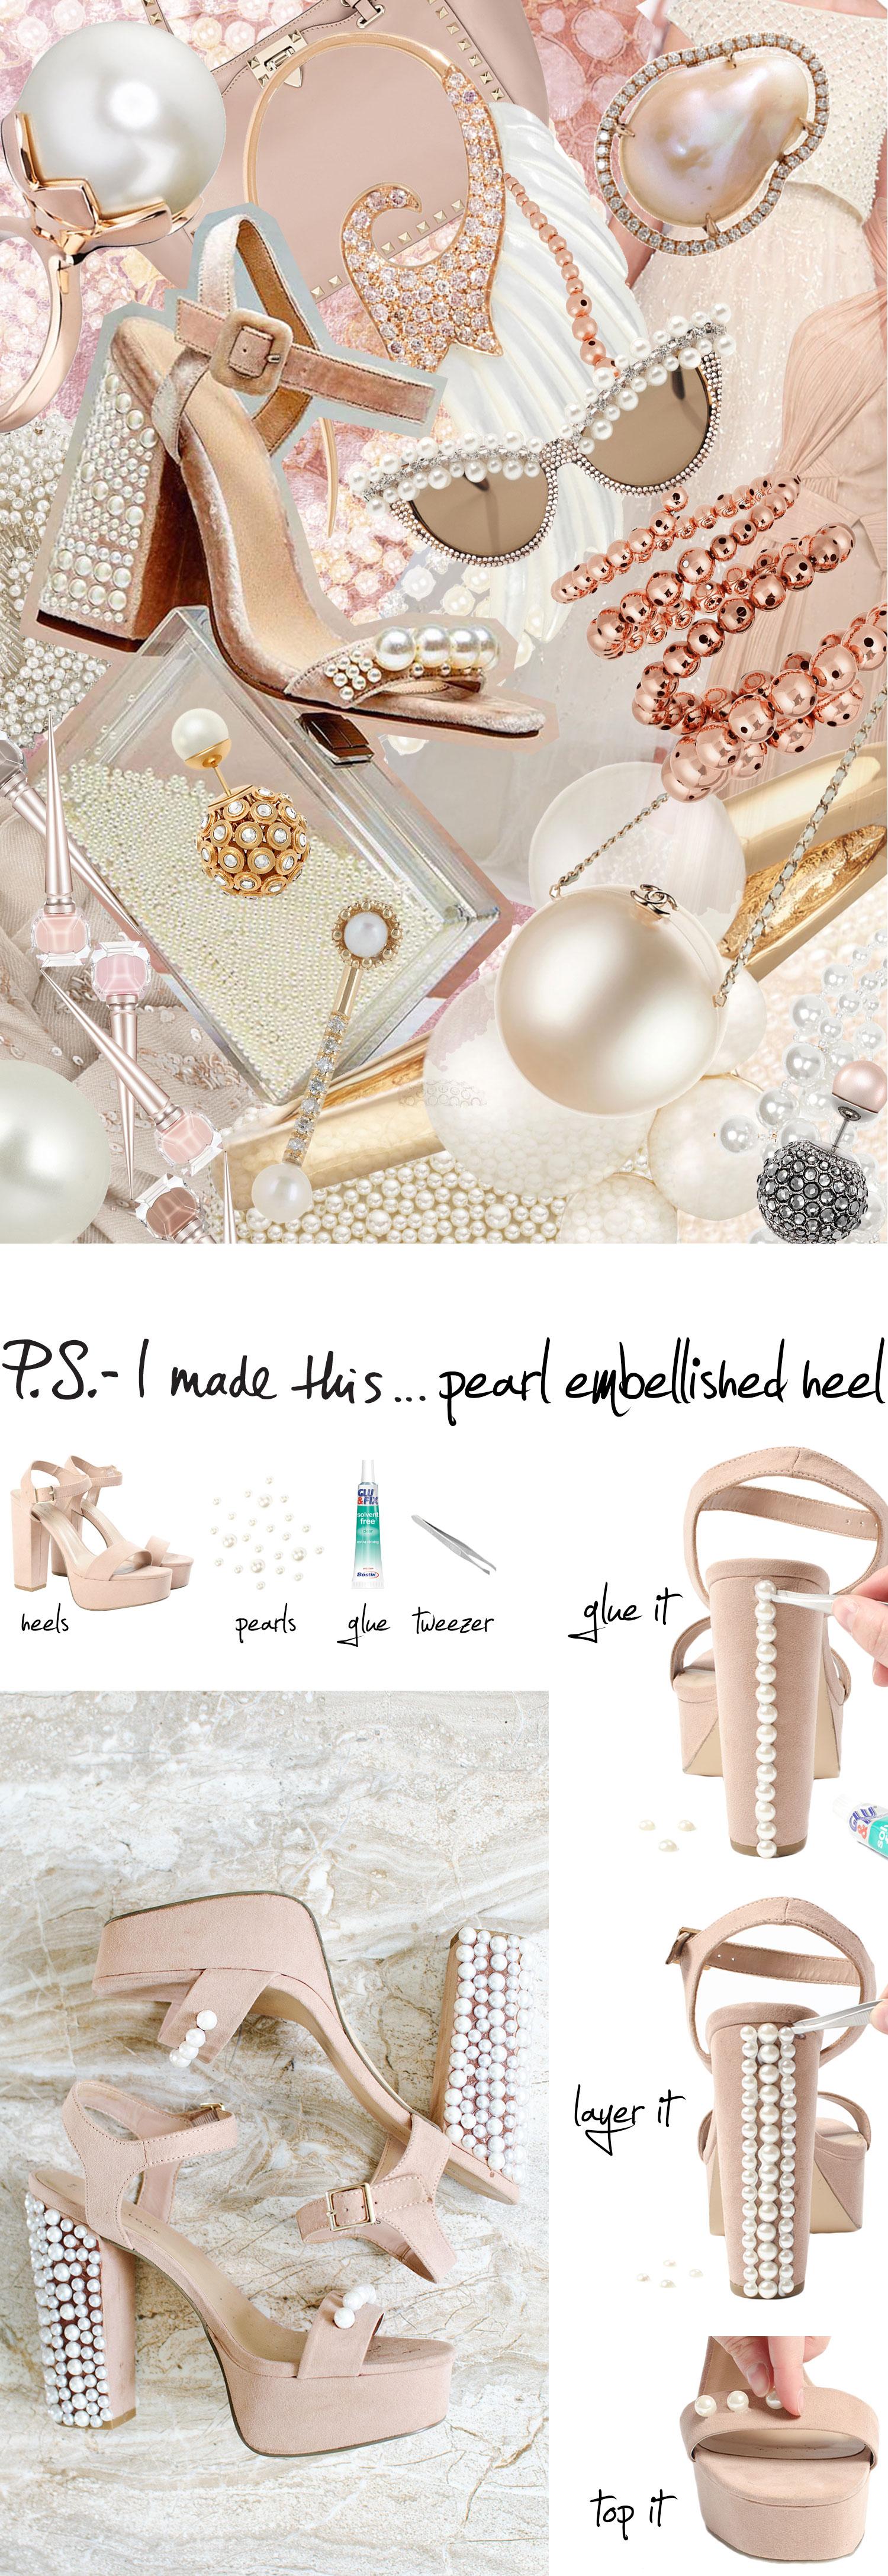 08.18.15_Pearl-Embellished-Heel